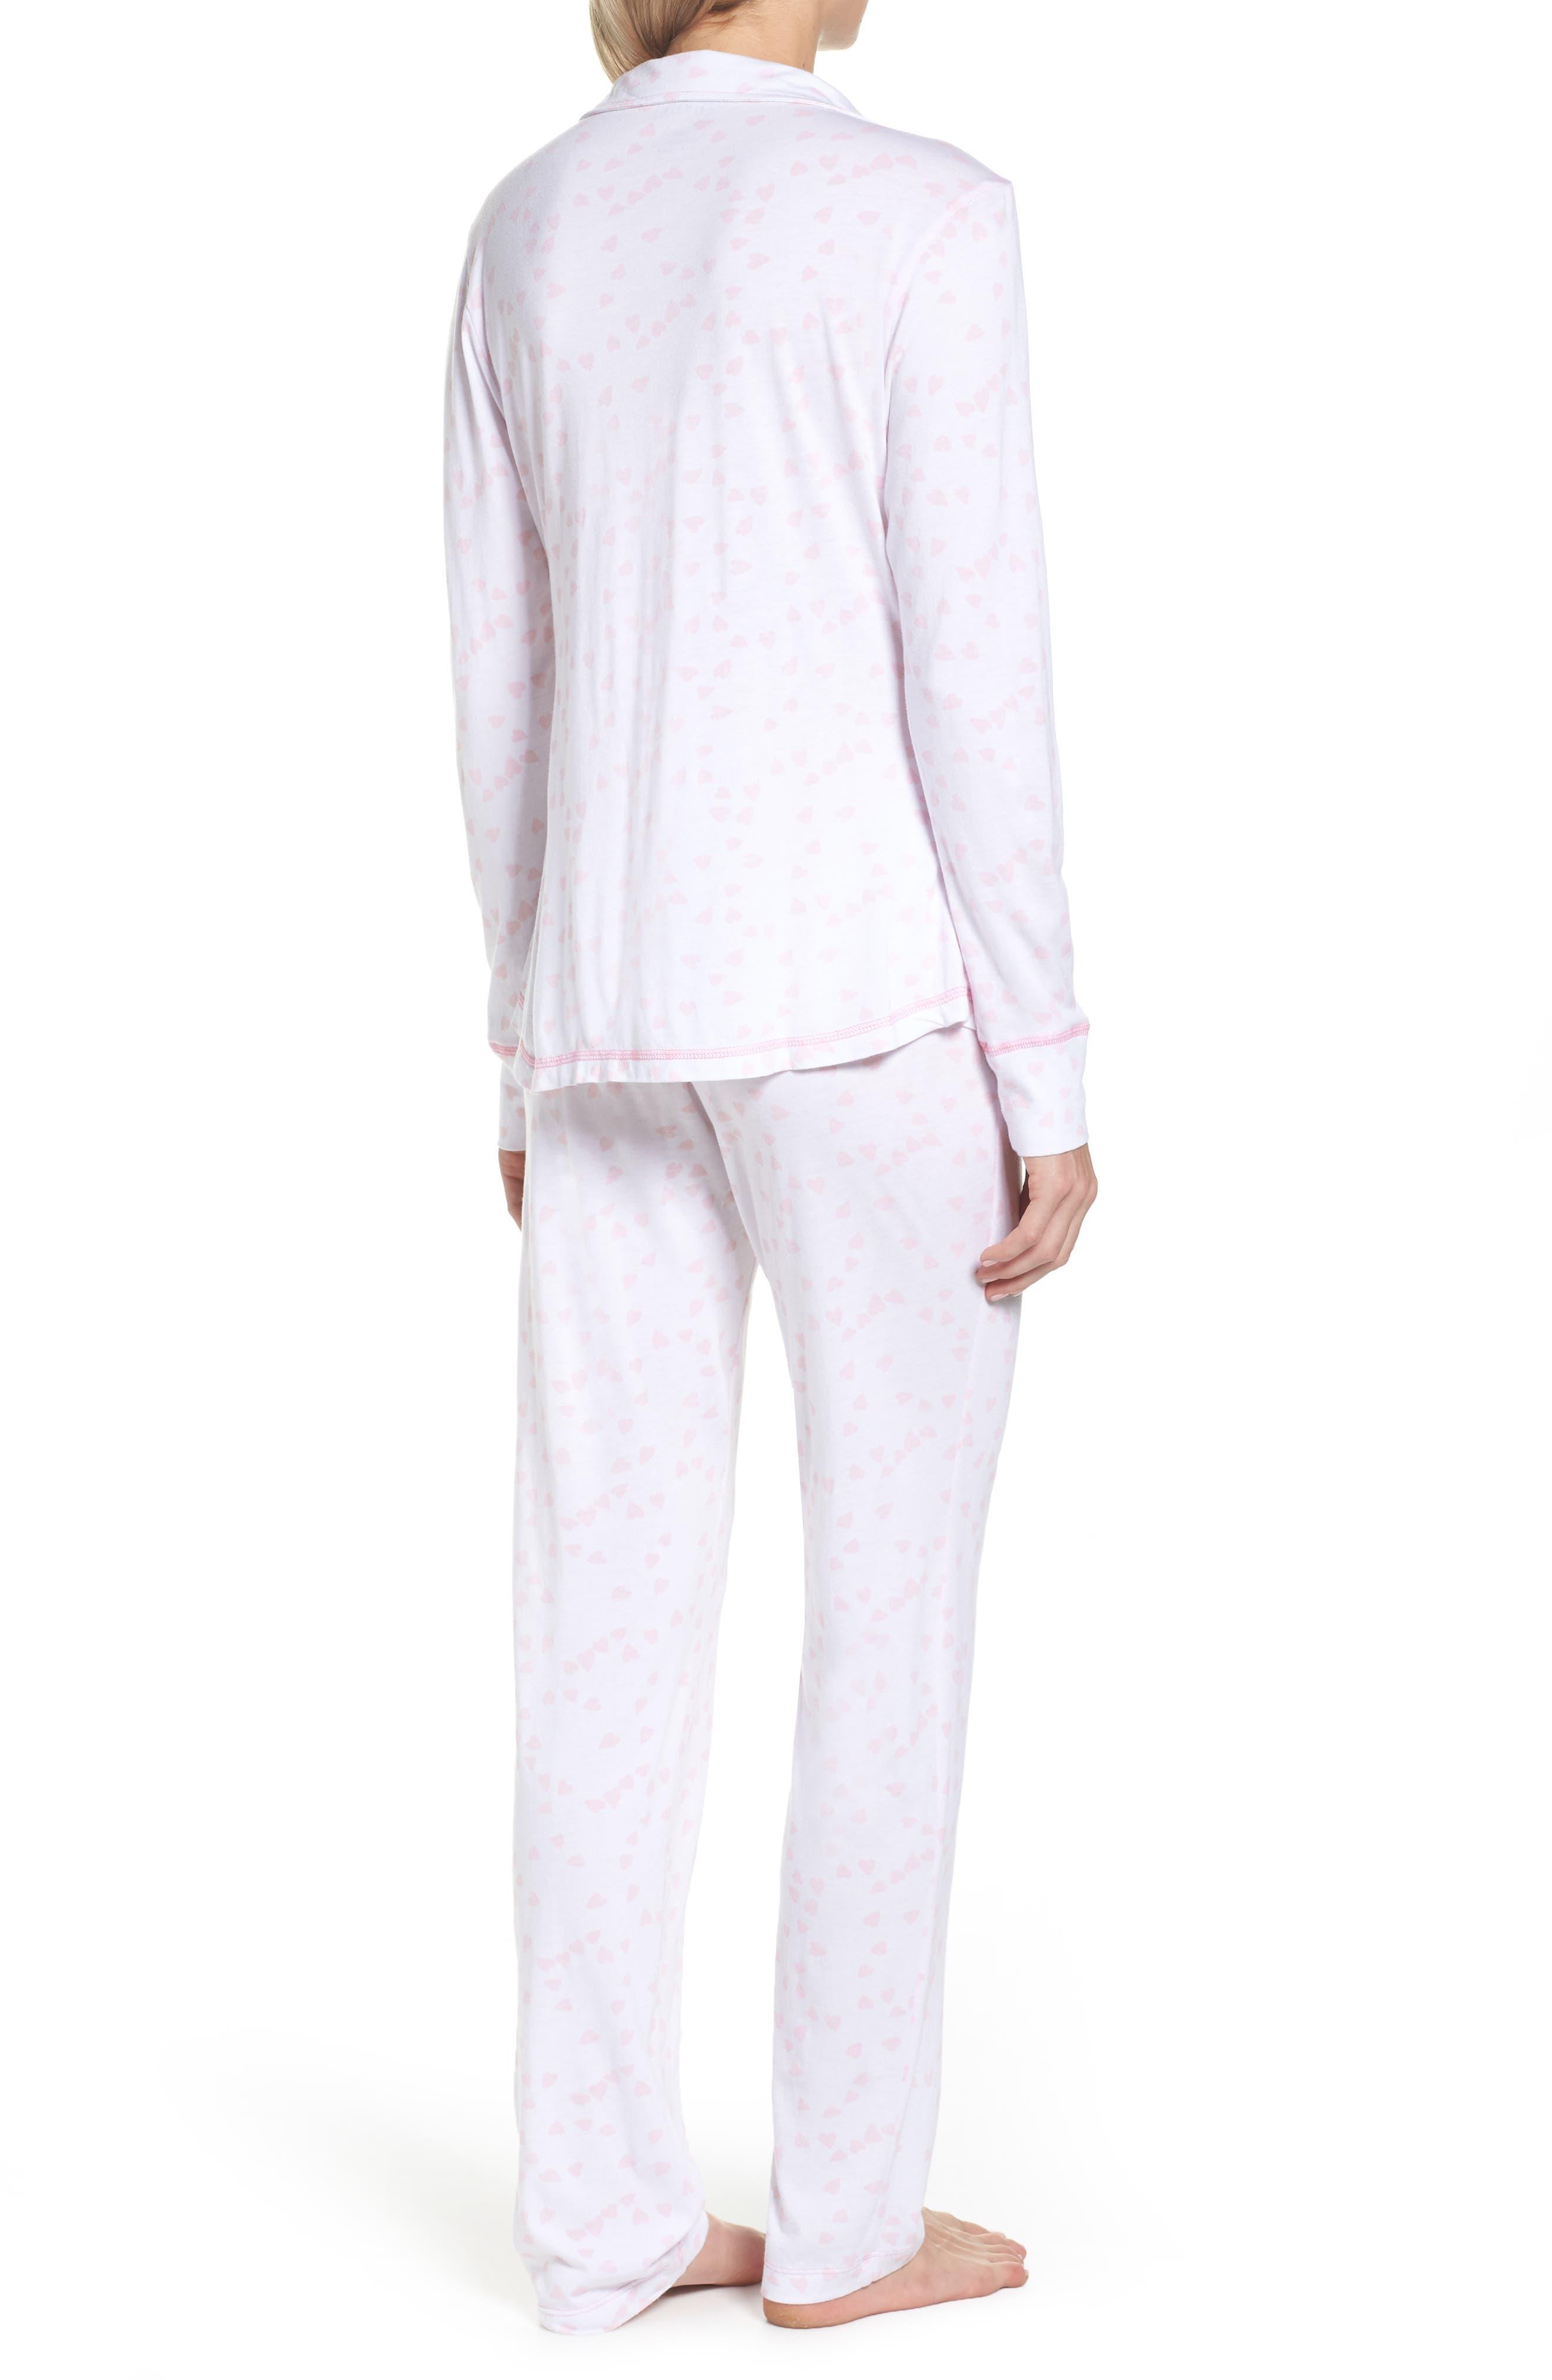 Cassie Pajamas,                             Alternate thumbnail 2, color,                             650